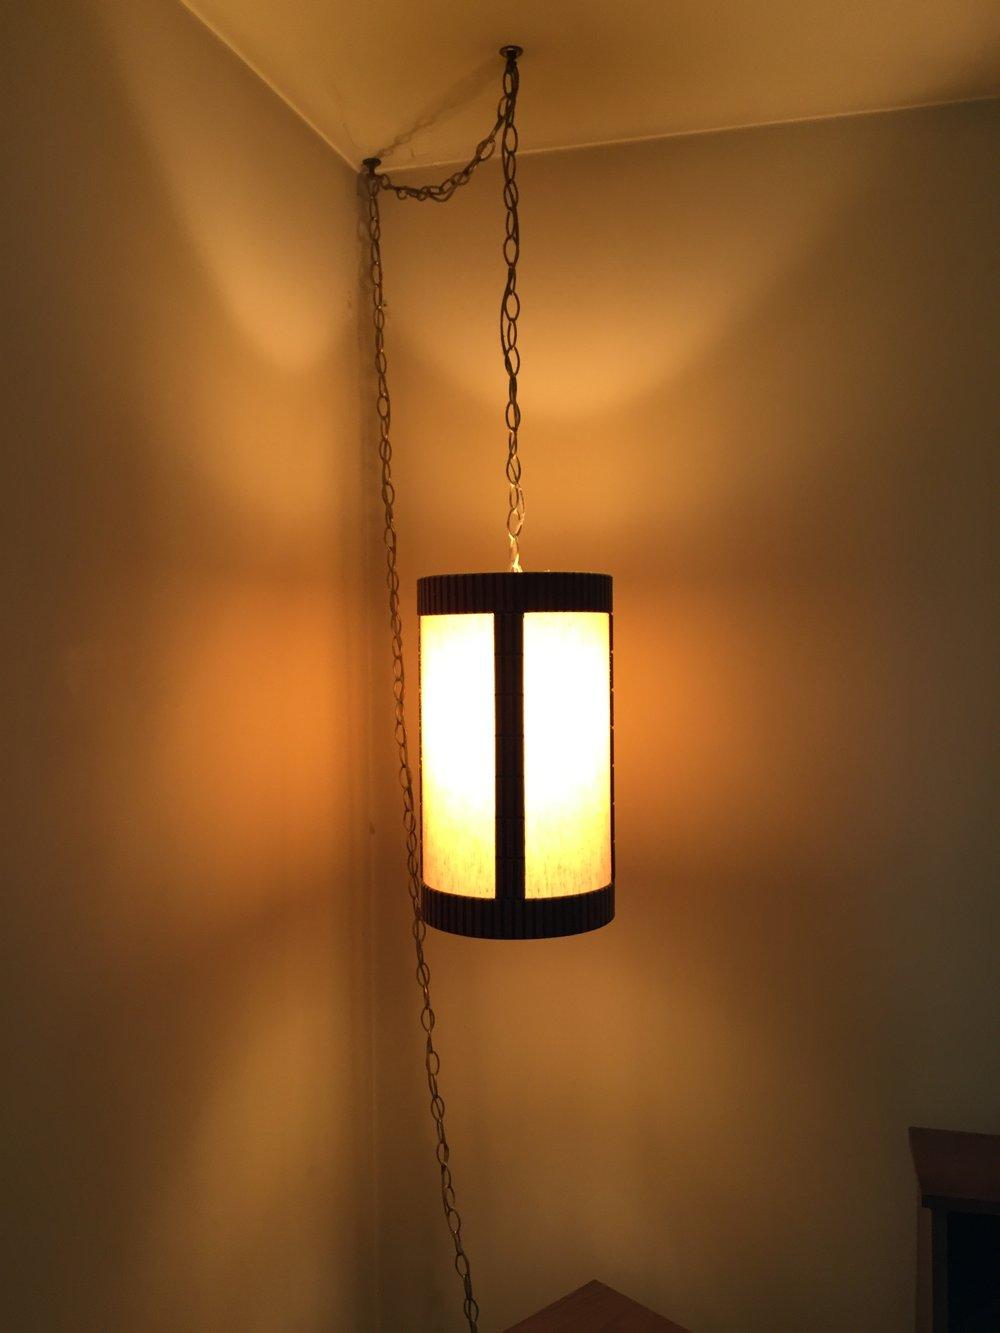 Swag light!